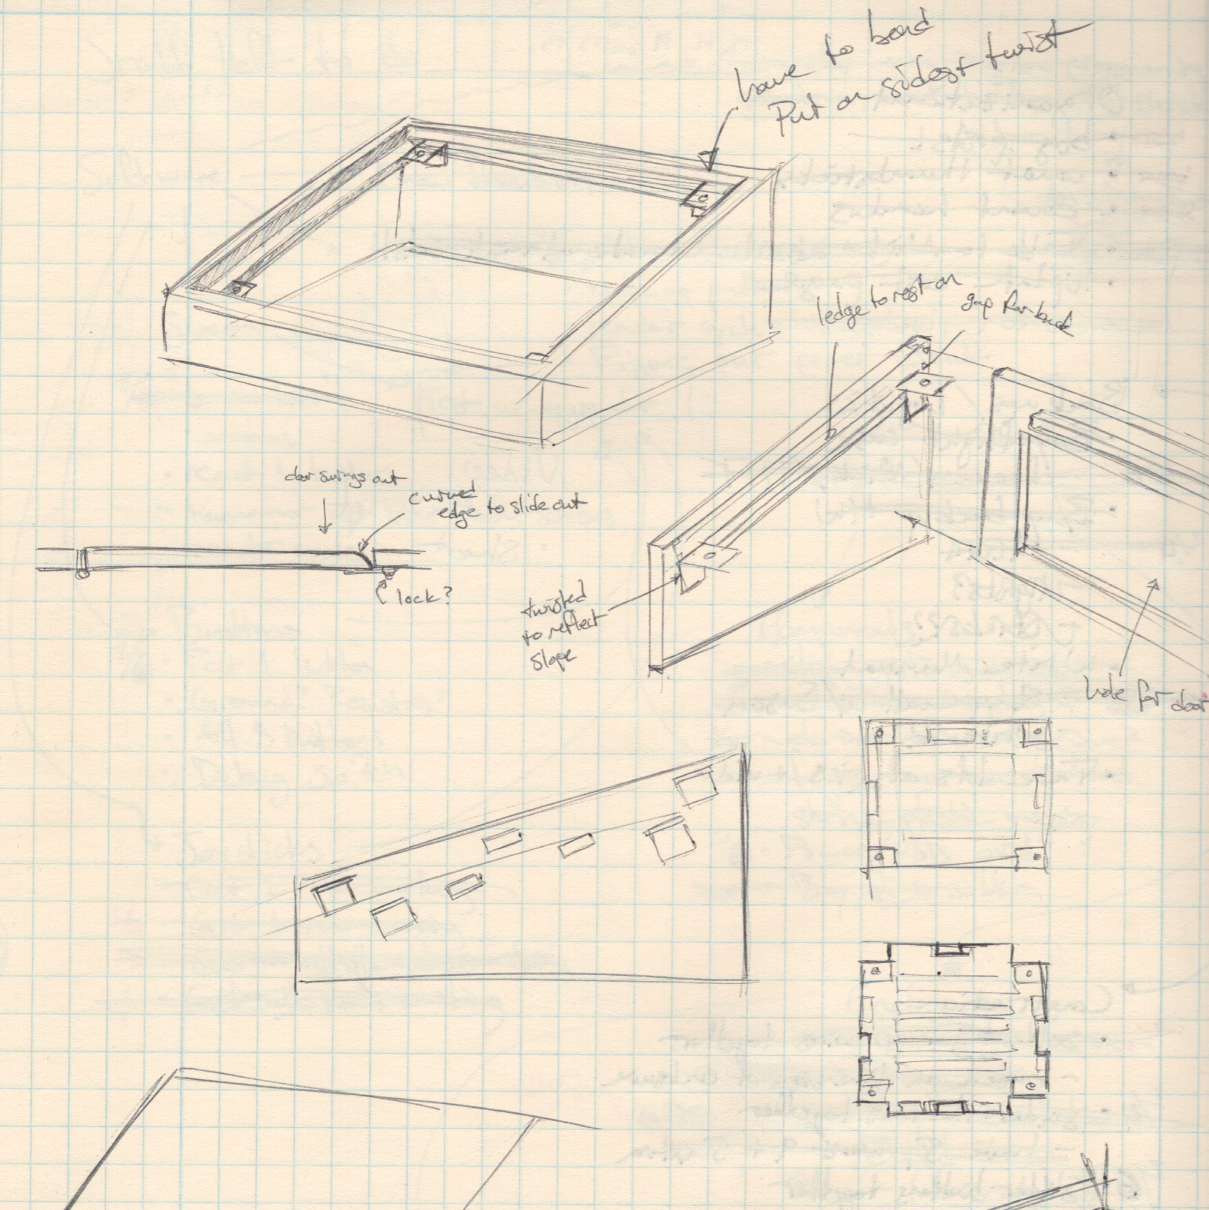 Joytone Sketches 2.png